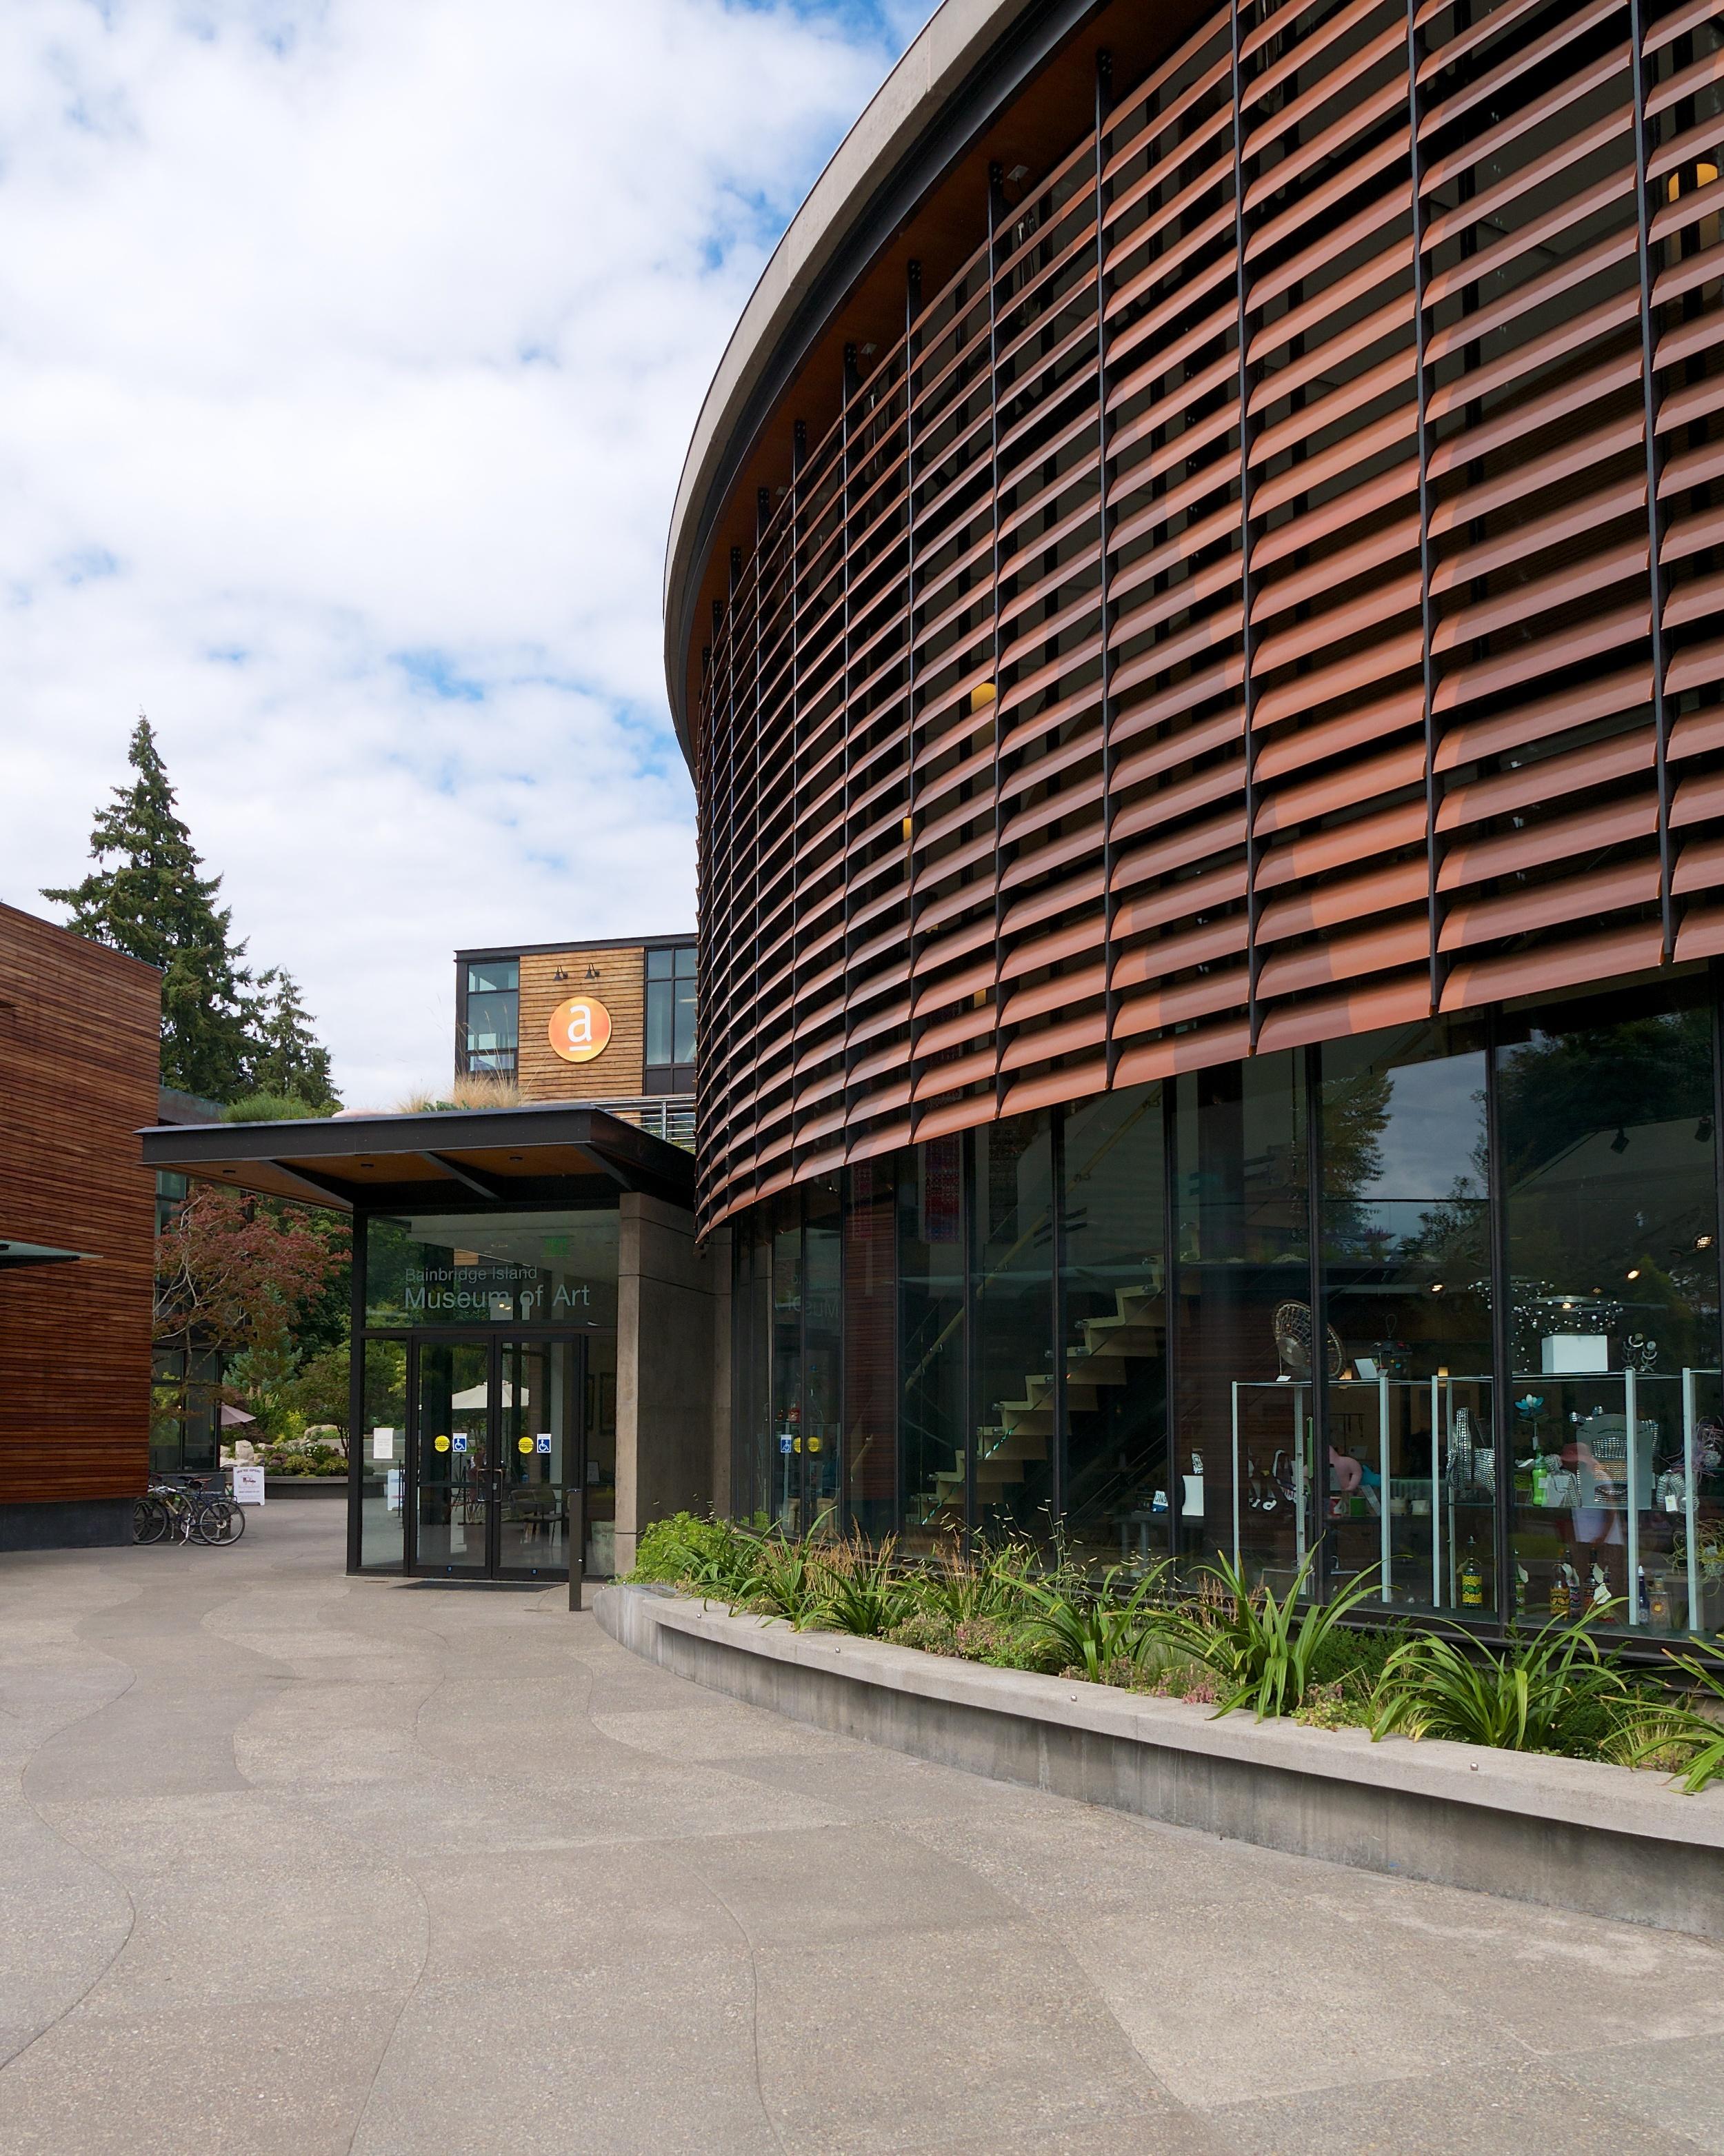 Bainbridge Island Museum of Art